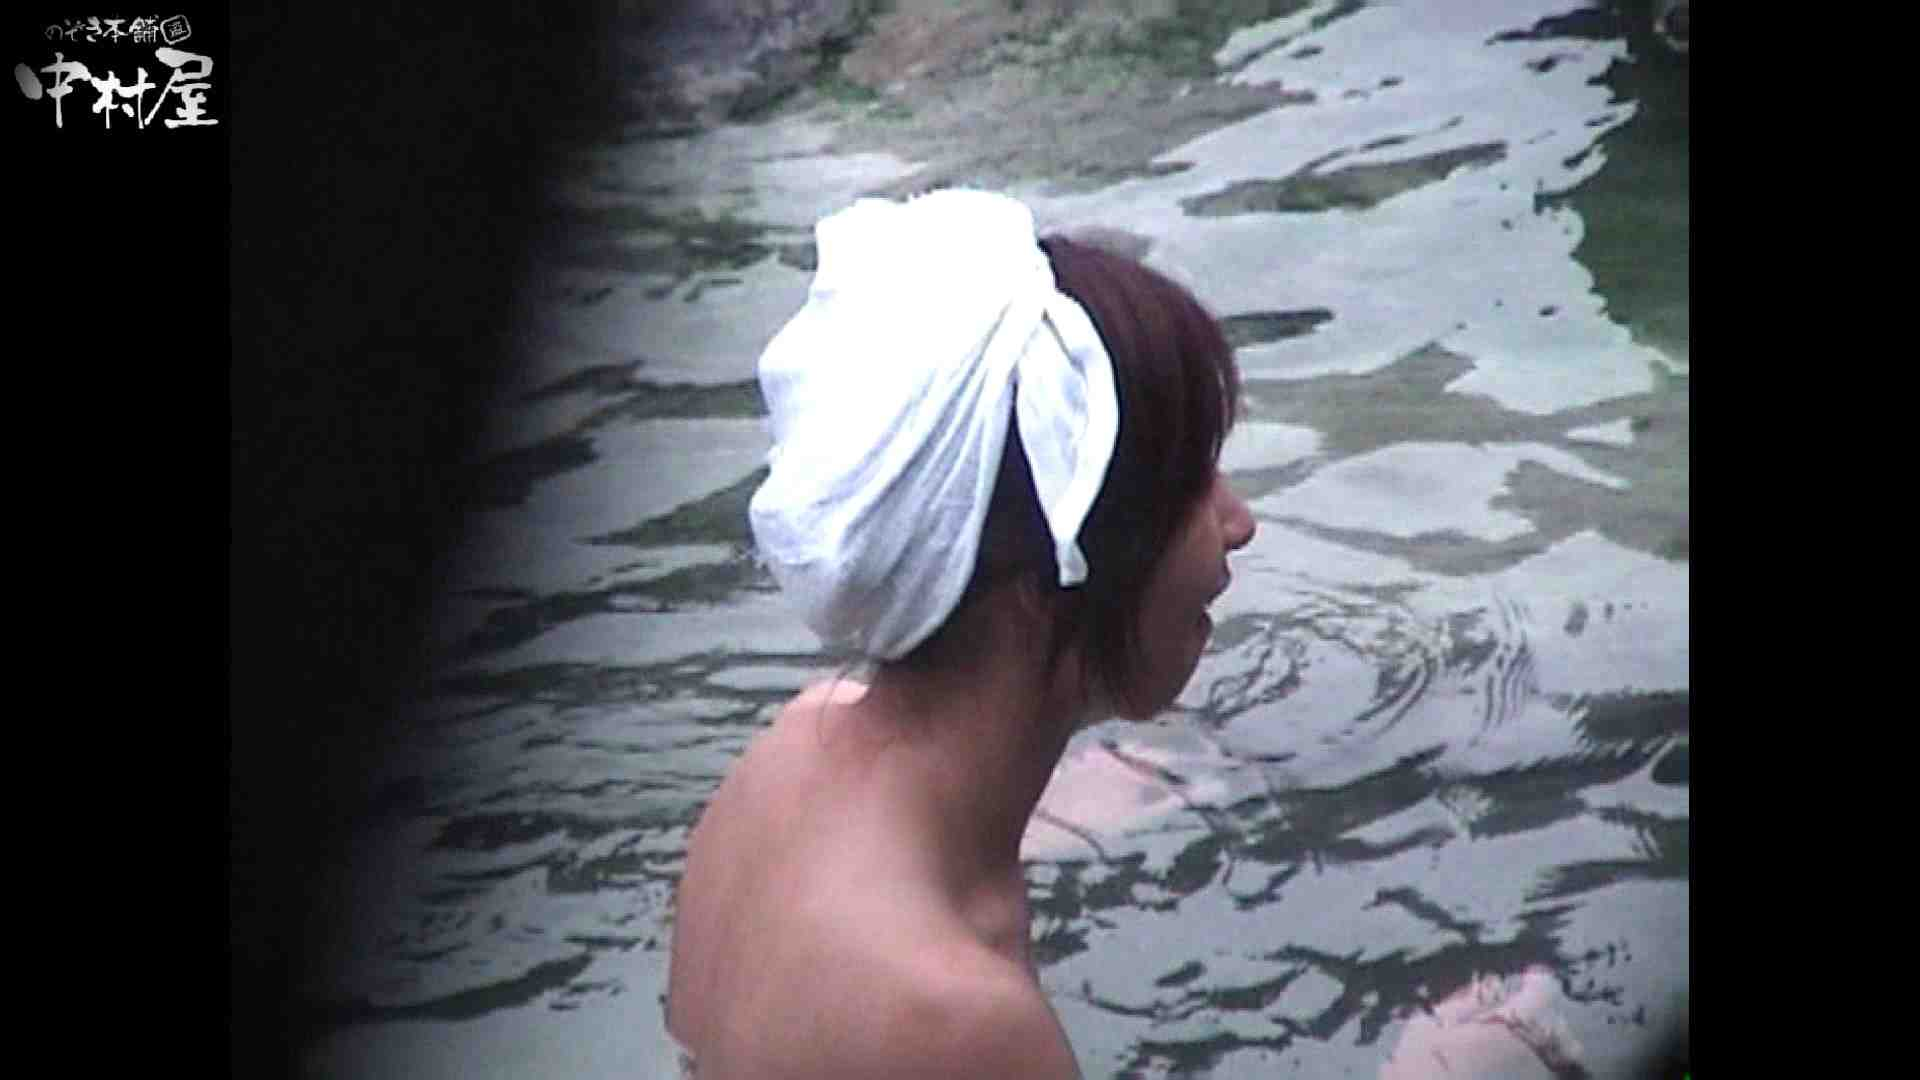 Aquaな露天風呂Vol.952 OLのエロ生活 おまんこ動画流出 106連発 62